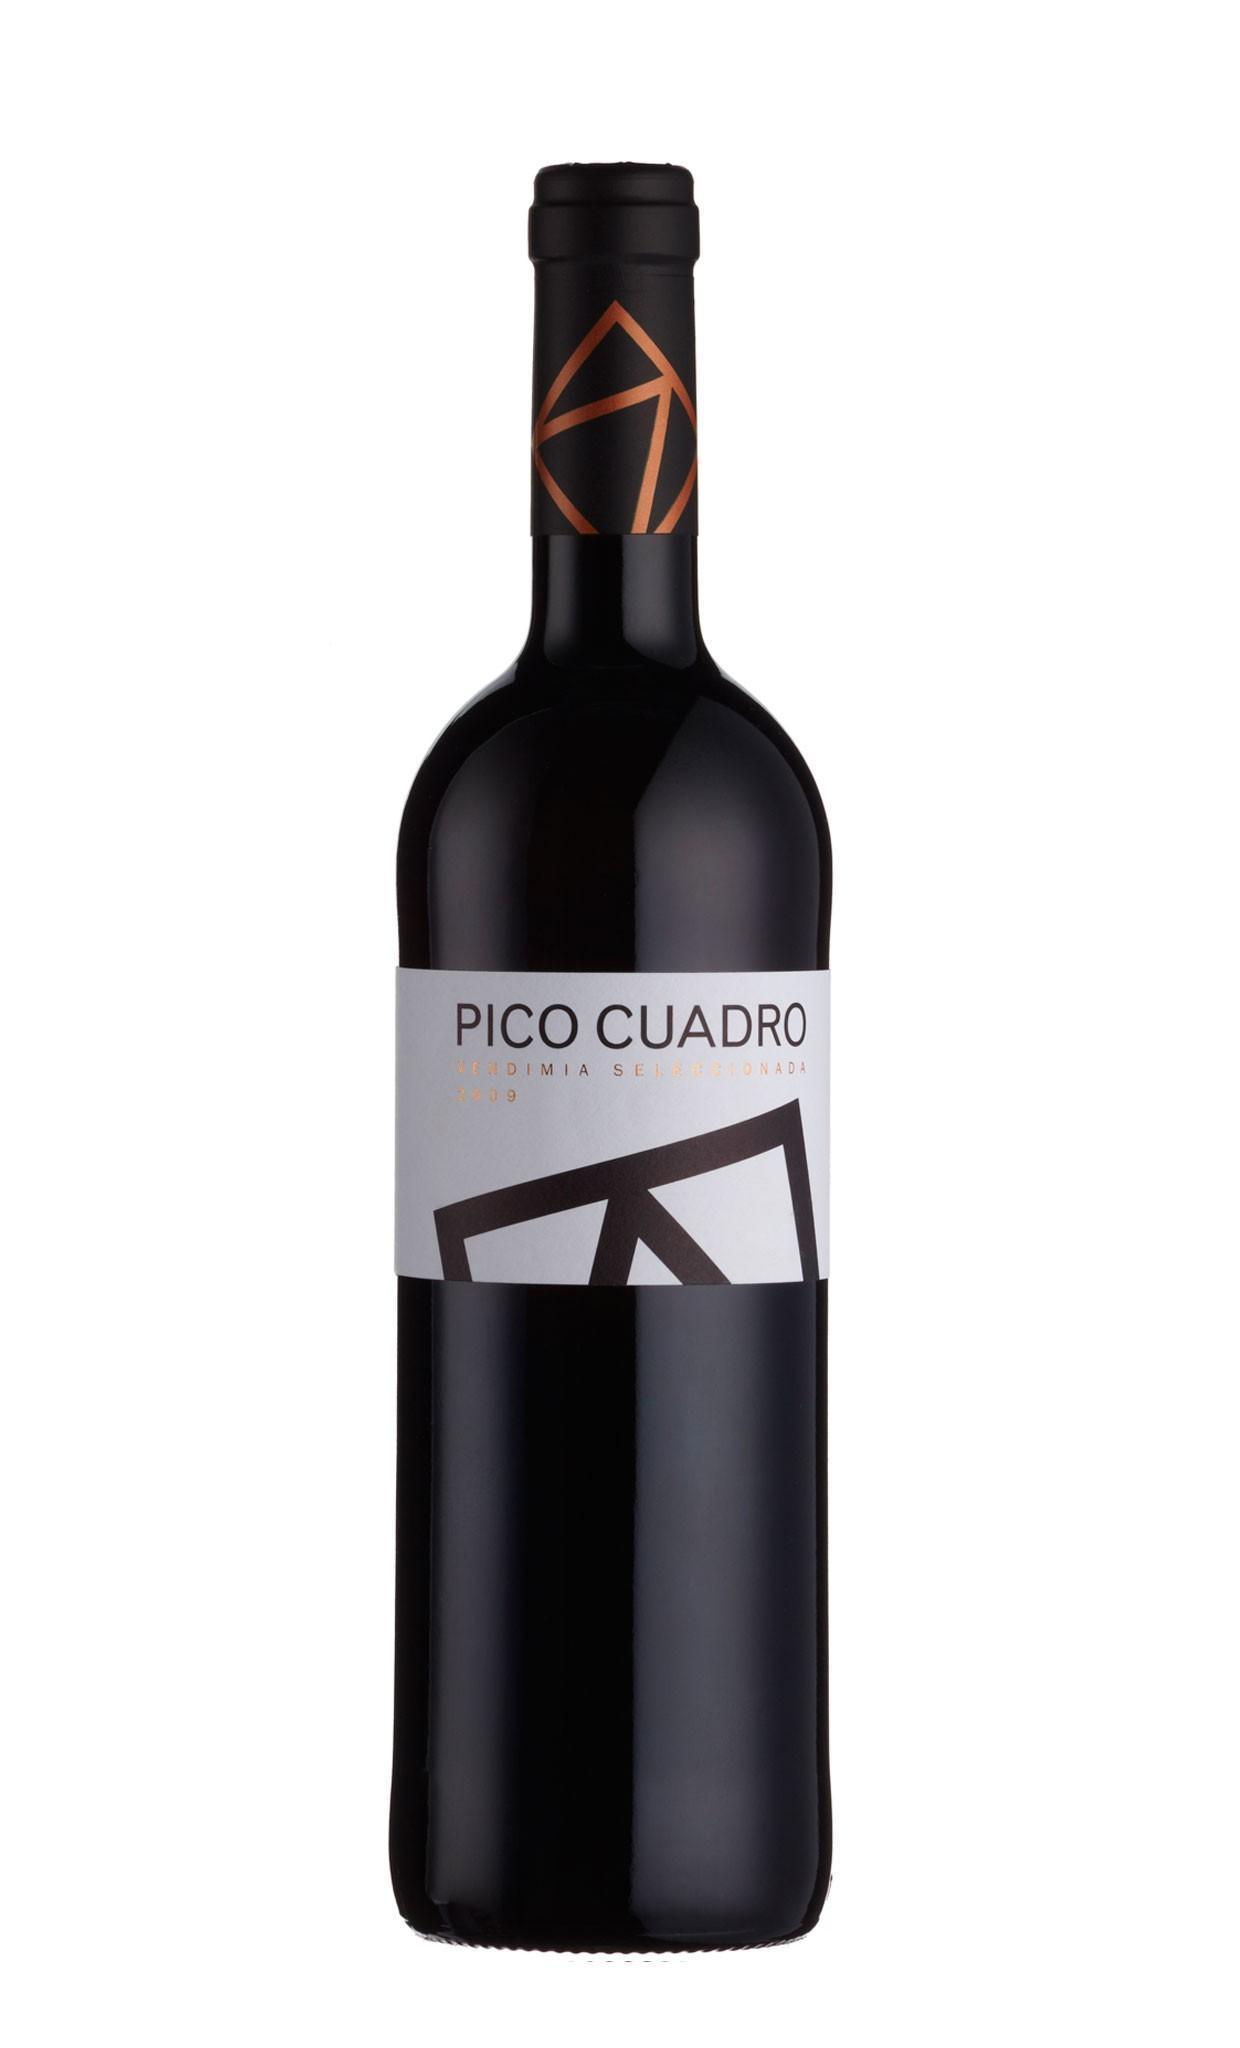 Ribera del duero -Pico Cuadro VS 2009 DO